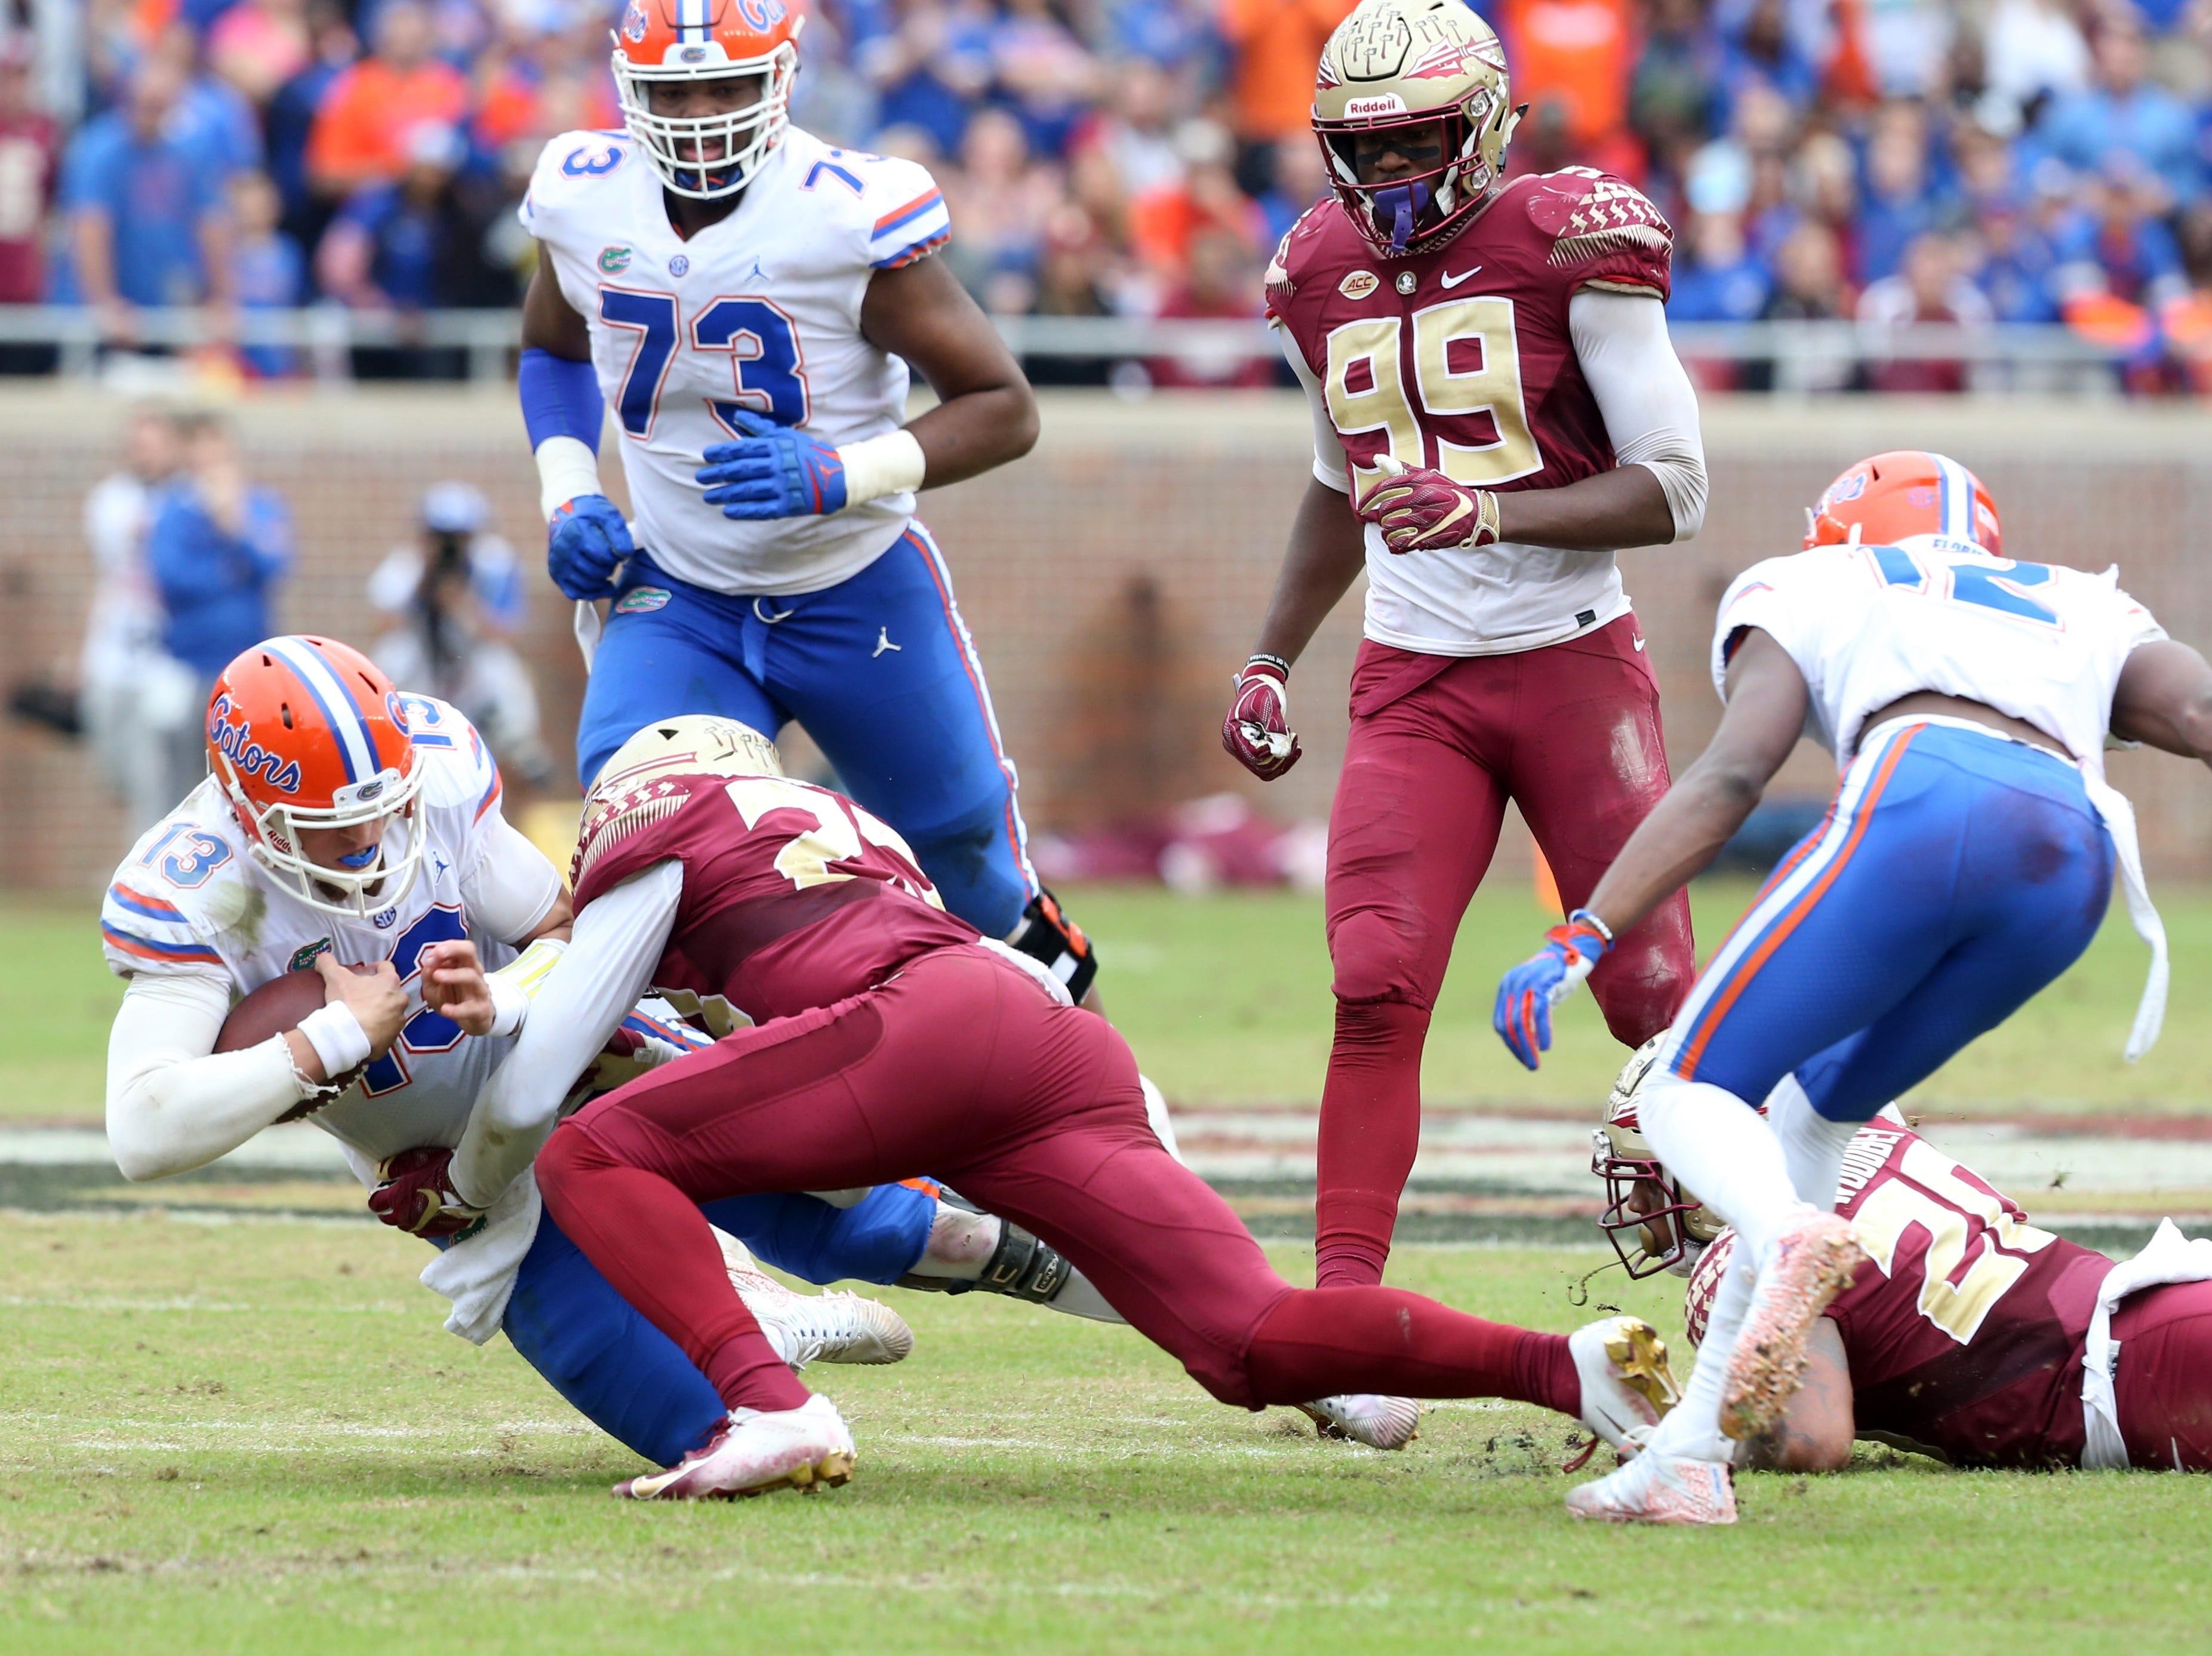 Florida Gators quarterback Feleipe Franks (13) gets taken down by the Seminole defense as the Florida State Seminoles take on their rival the Florida Gators in college football at Doak S. Campbell Stadium, Saturday, Nov. 24, 2018.